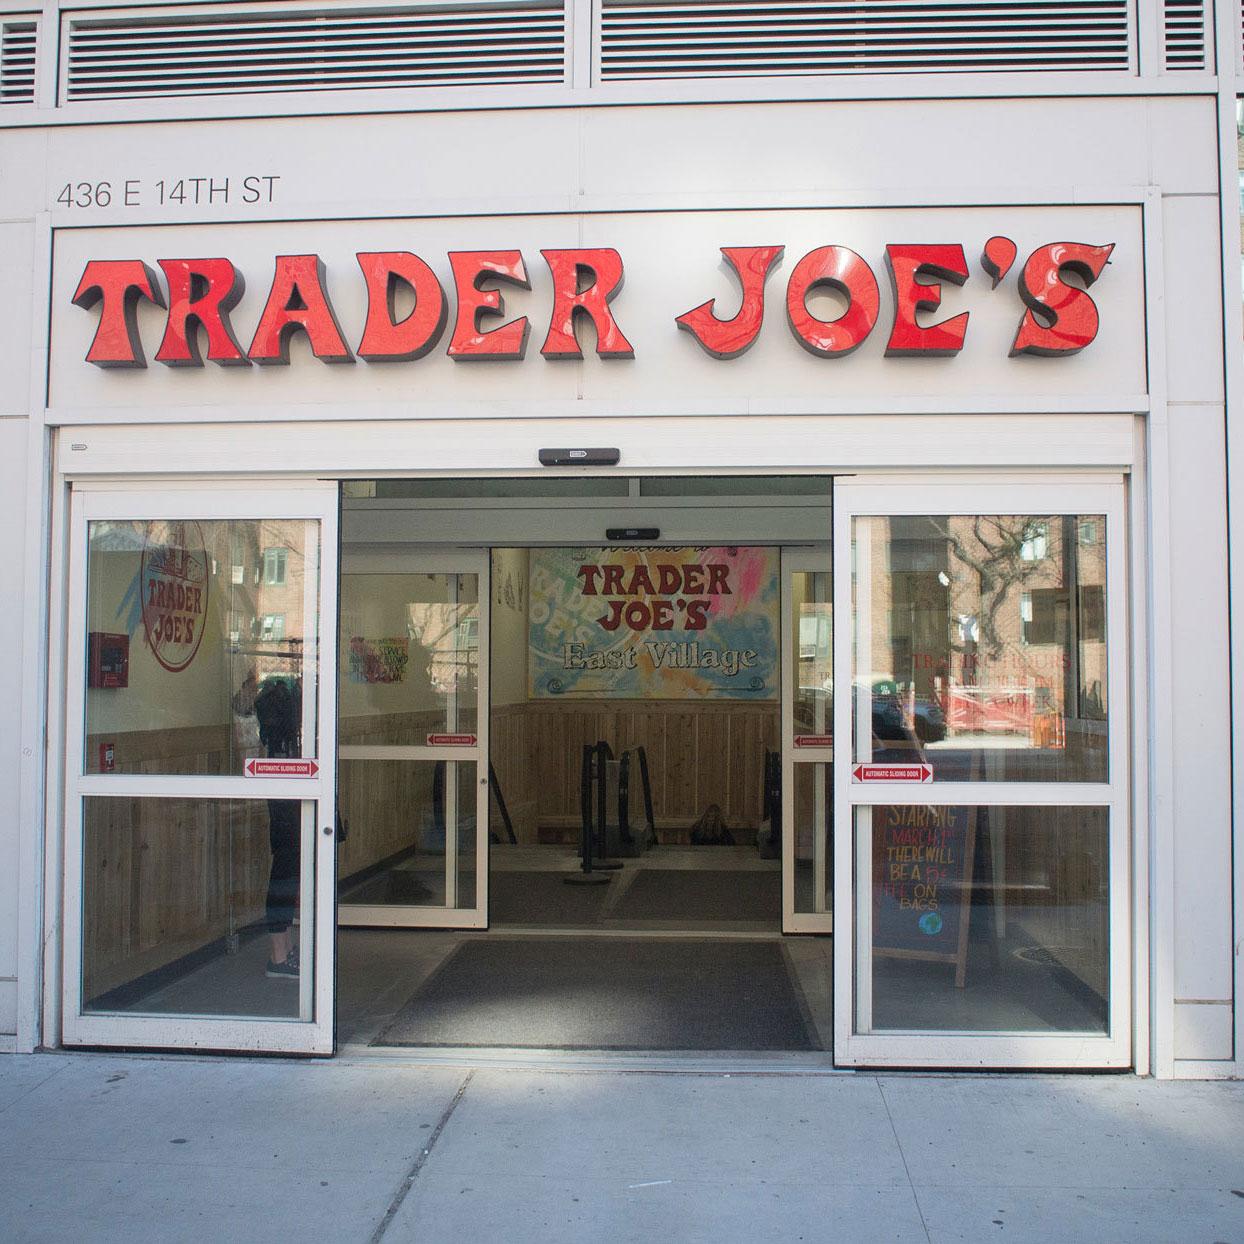 Trader Joe's storefront